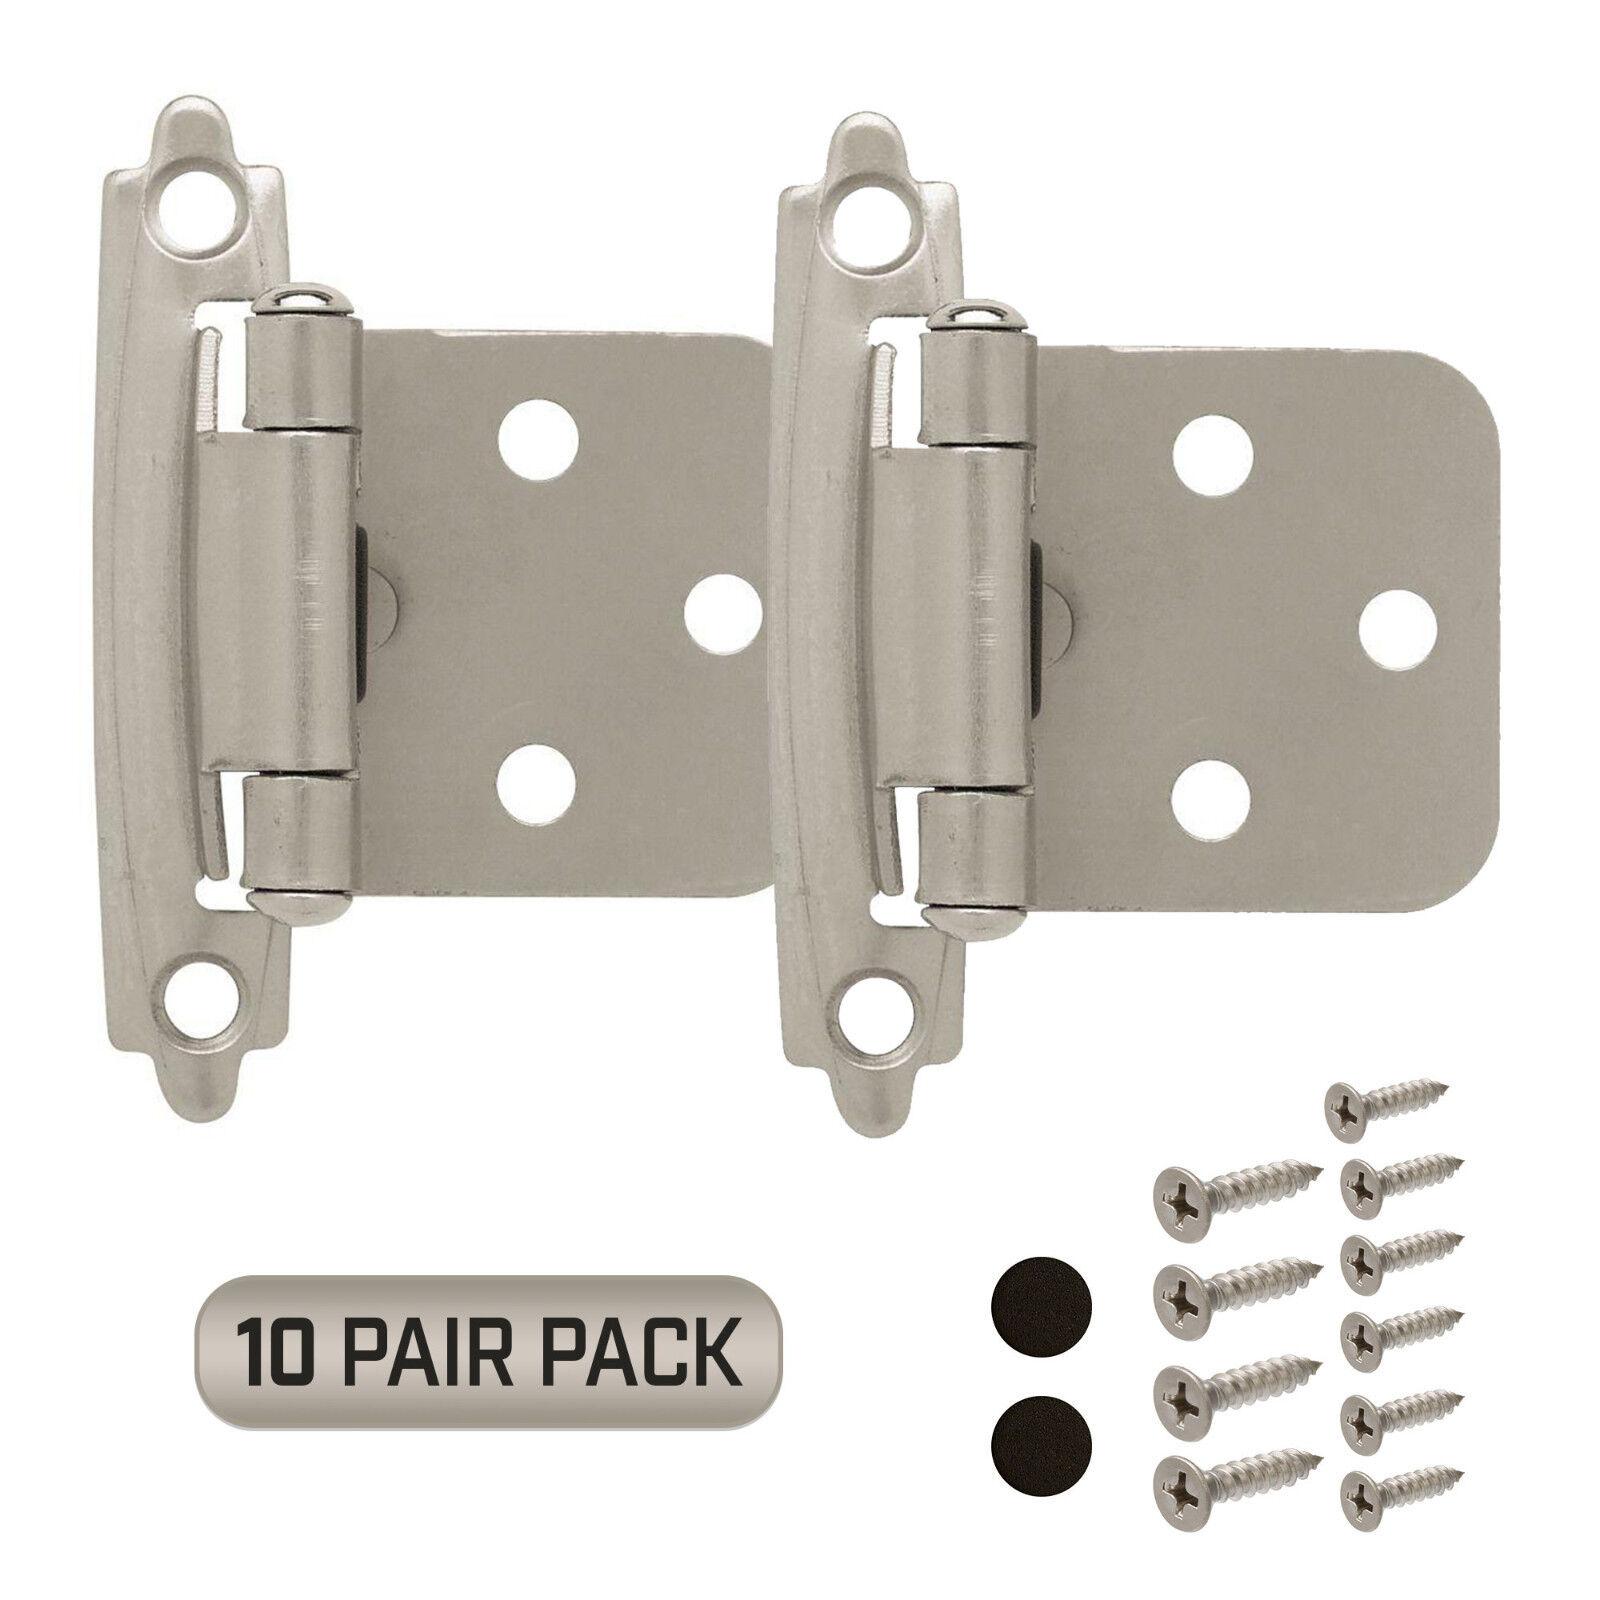 Cabinet Hinge 10 Pair Pack (20 Pcs) Self Closing Face Mount Overlay Satin Nickel Building & Hardware